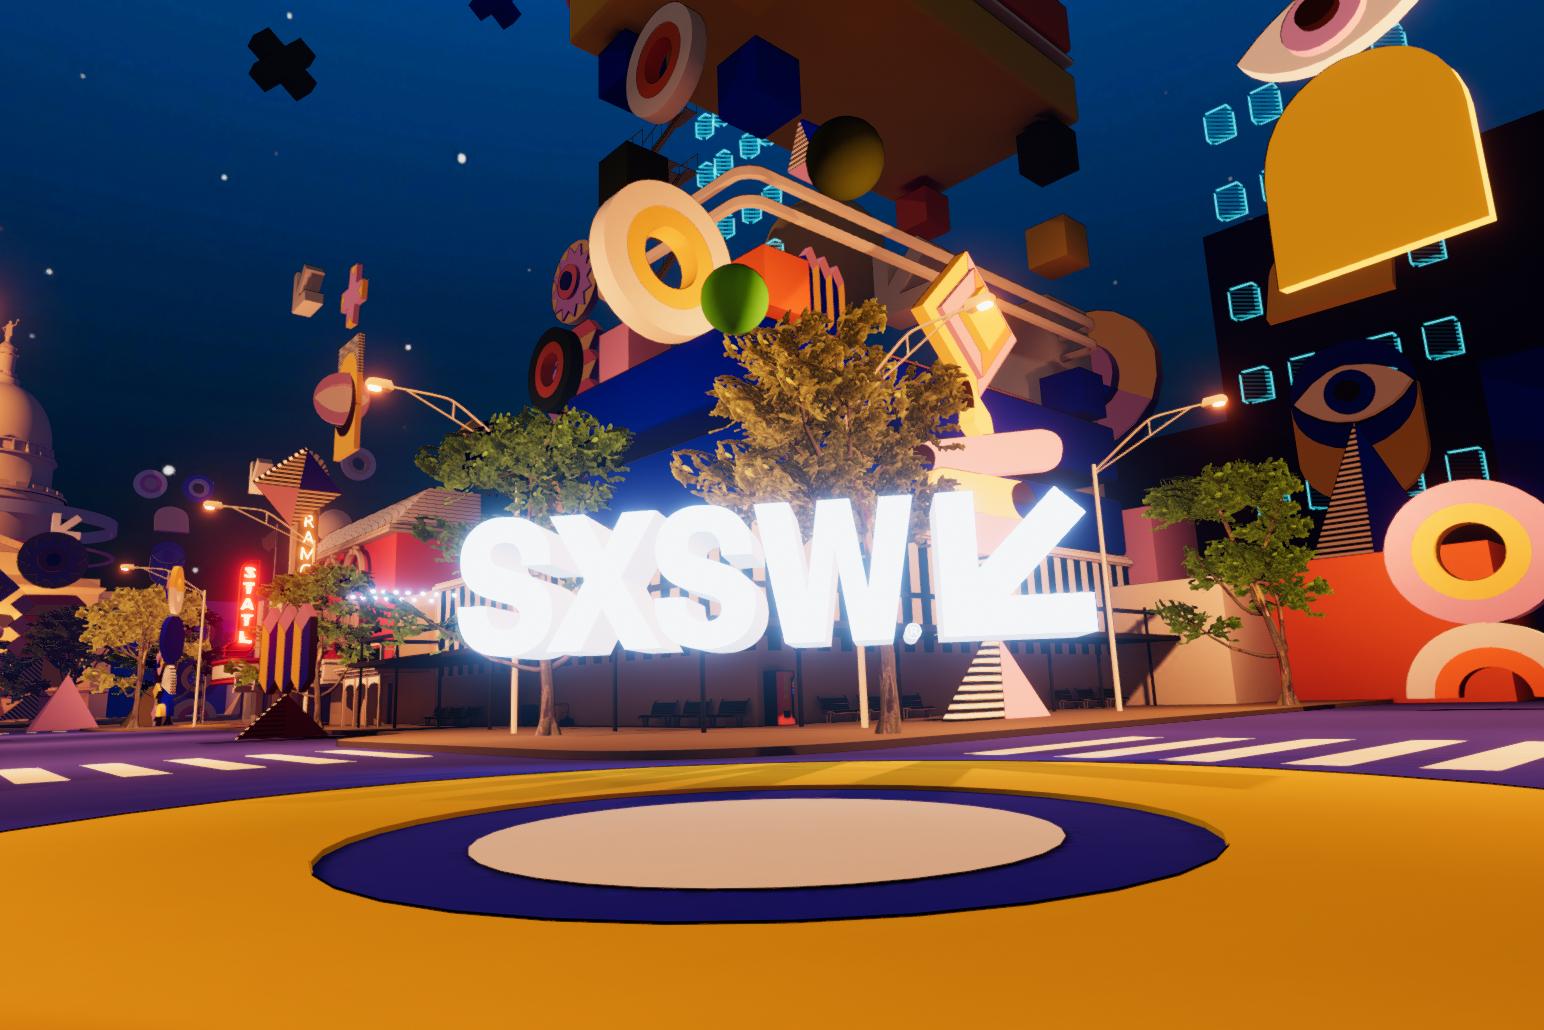 SXSW builds a virtual Austin